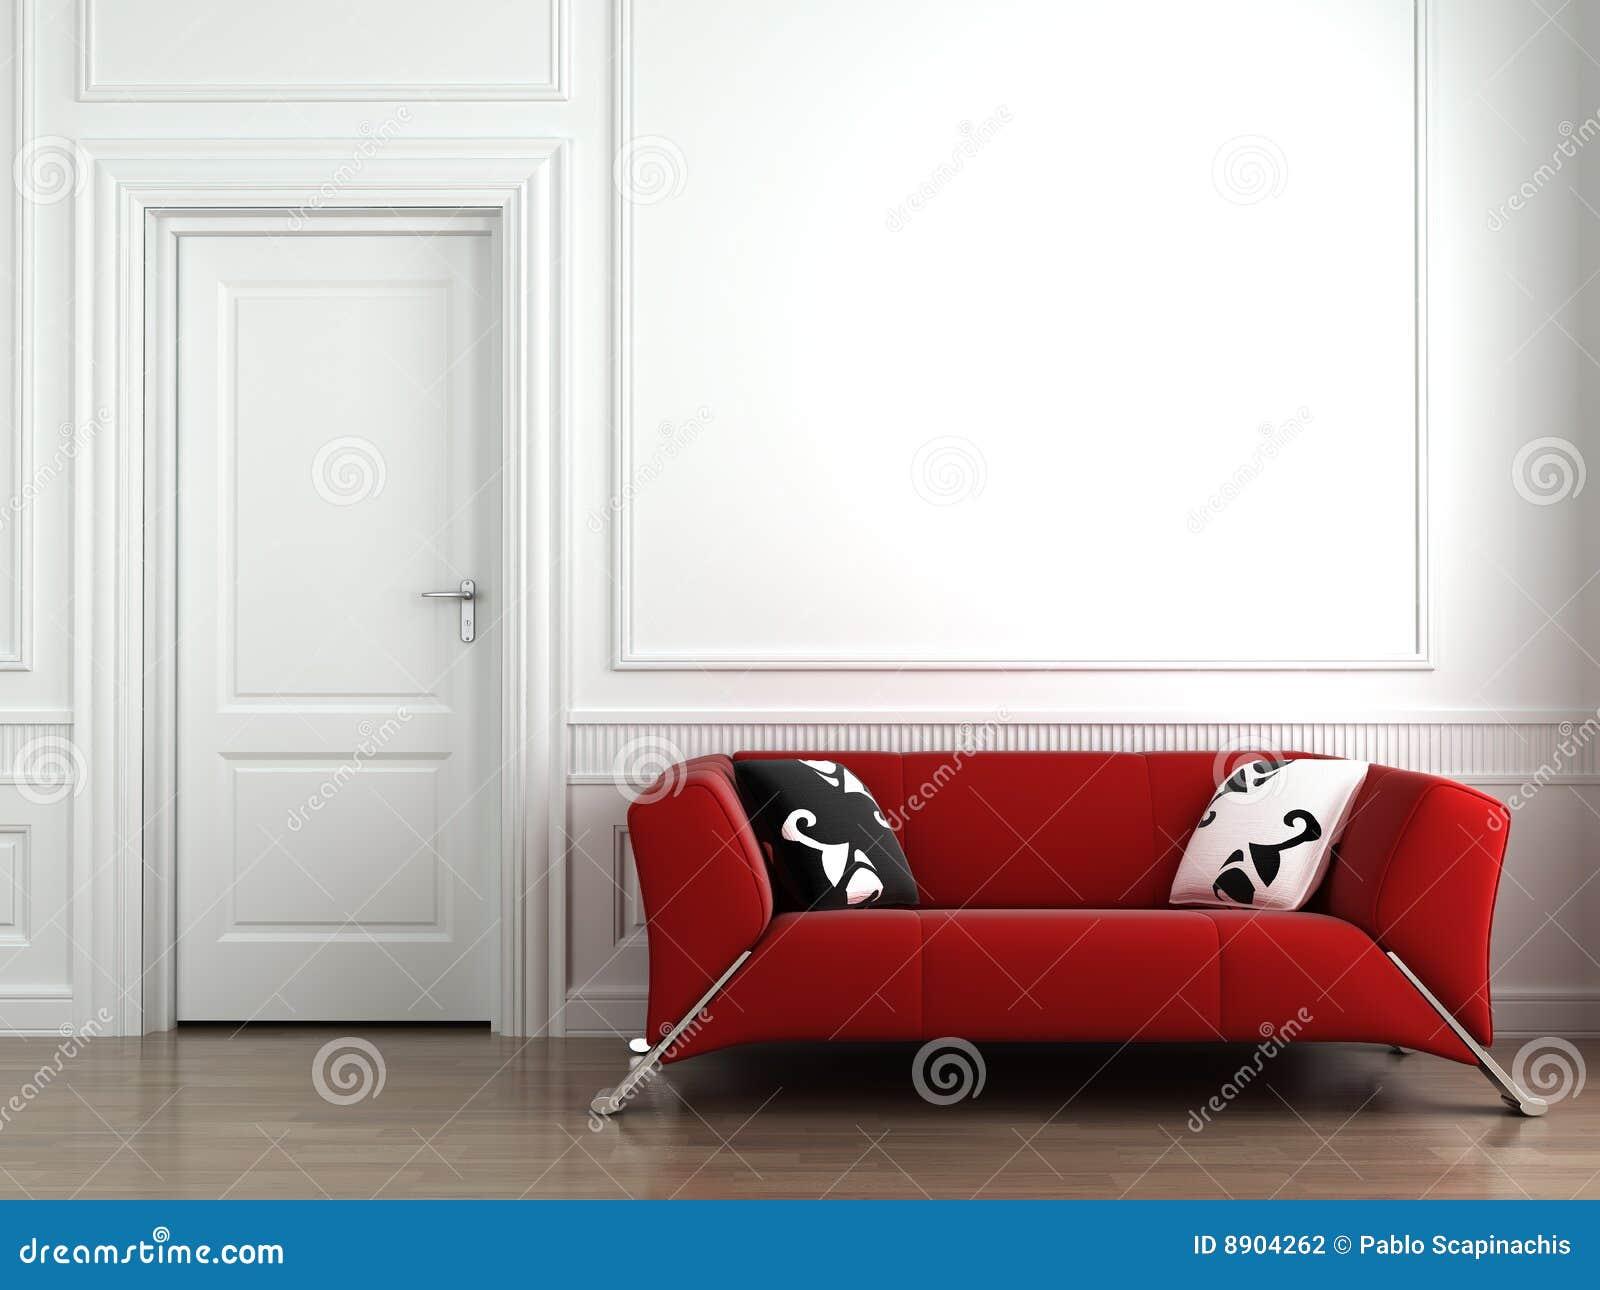 Slaapkamers plafond kleur aanpassen - Eetkamer leunstoel ...